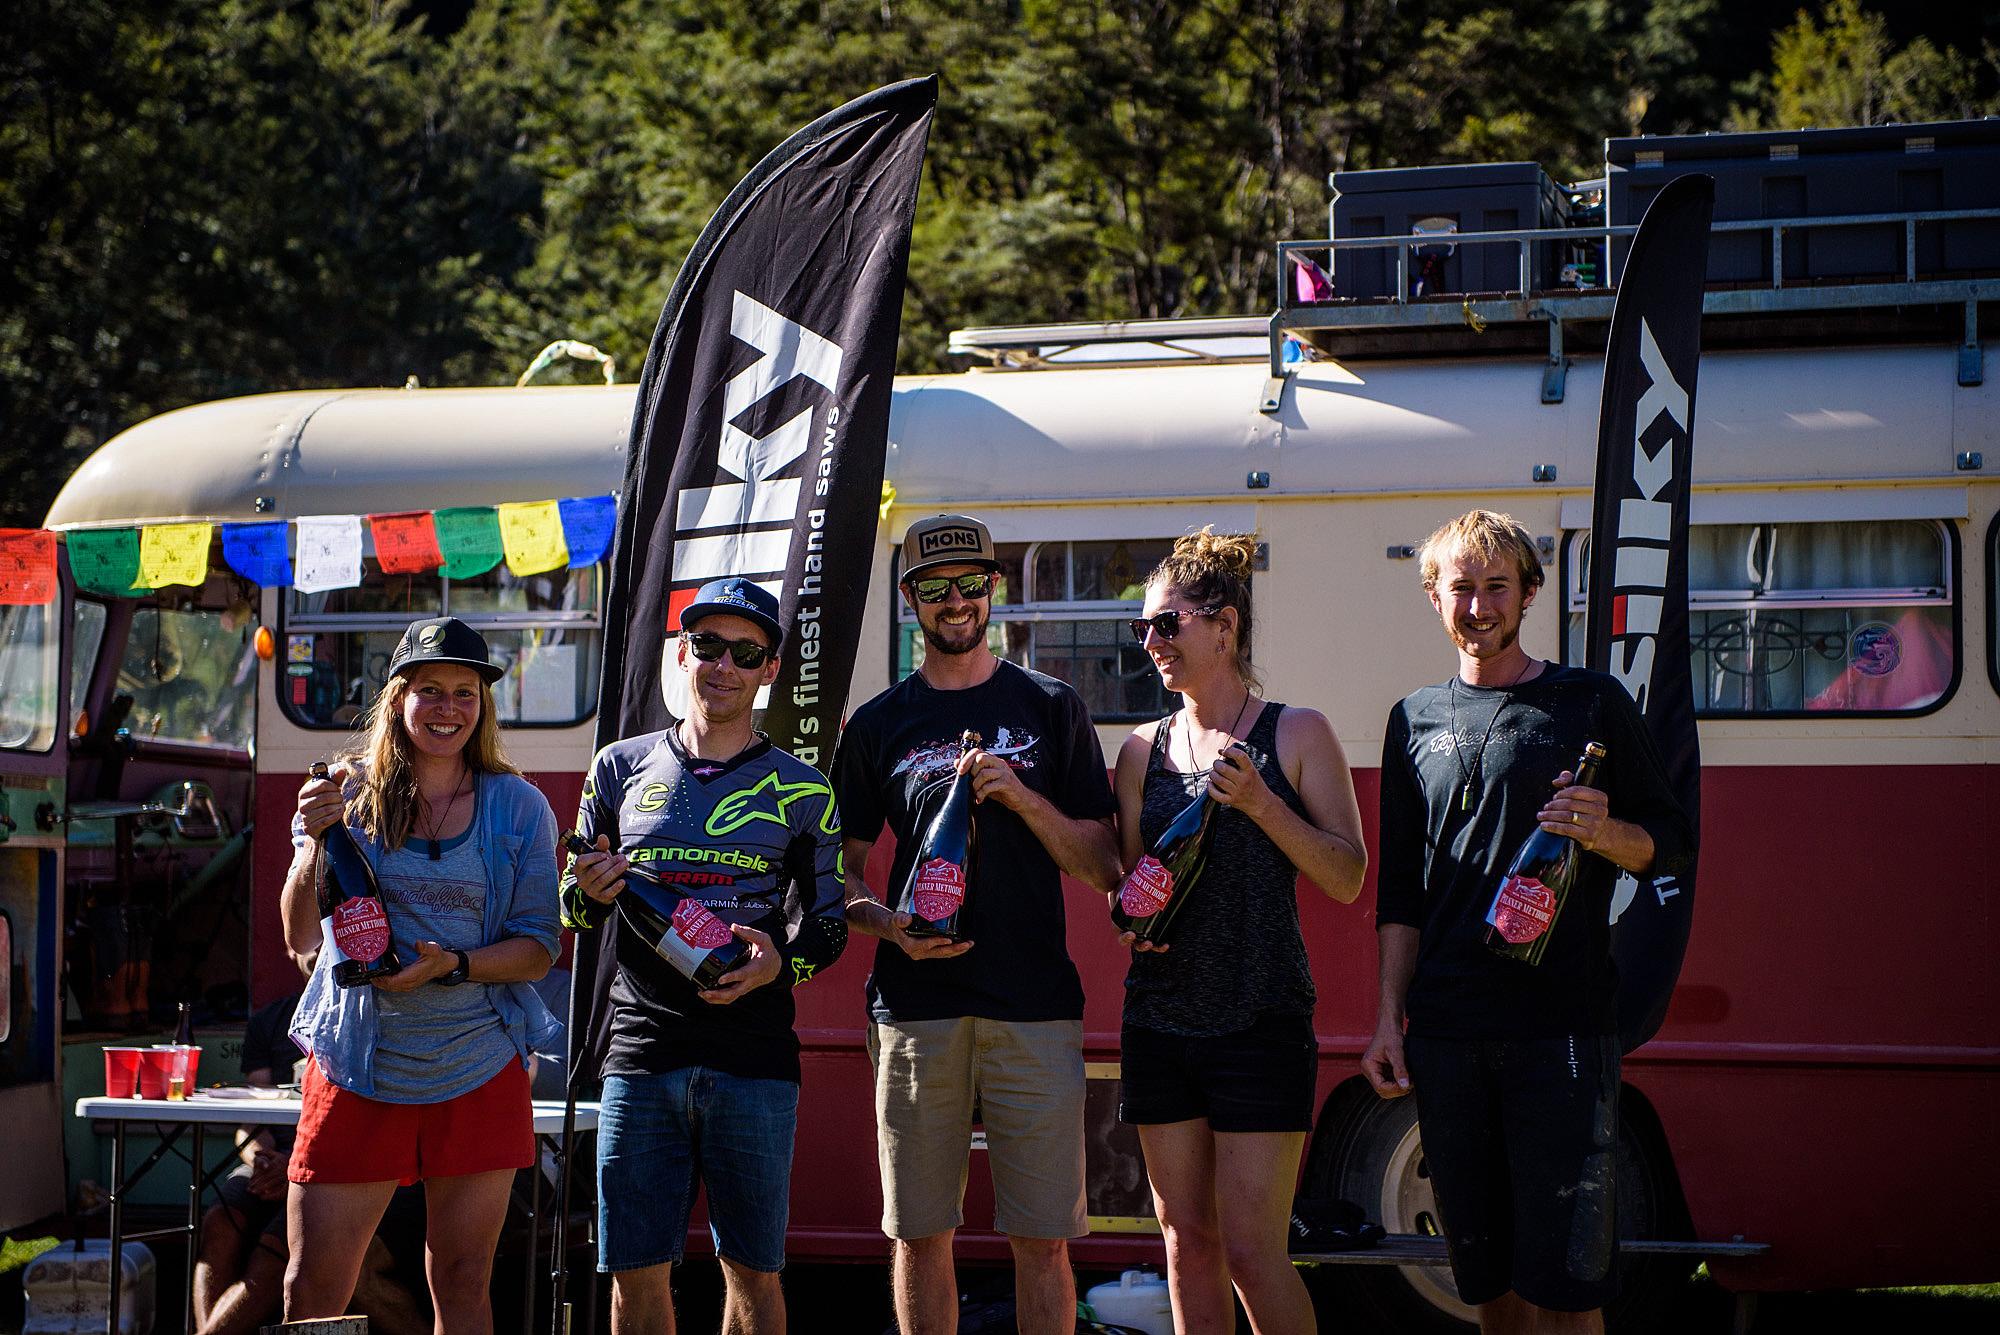 The NZ Enduro 2018 category winners. Anja Mcdonald, Jerome Clementz, Nick Sutcliffe, Emily Slaco and Joshua Foster